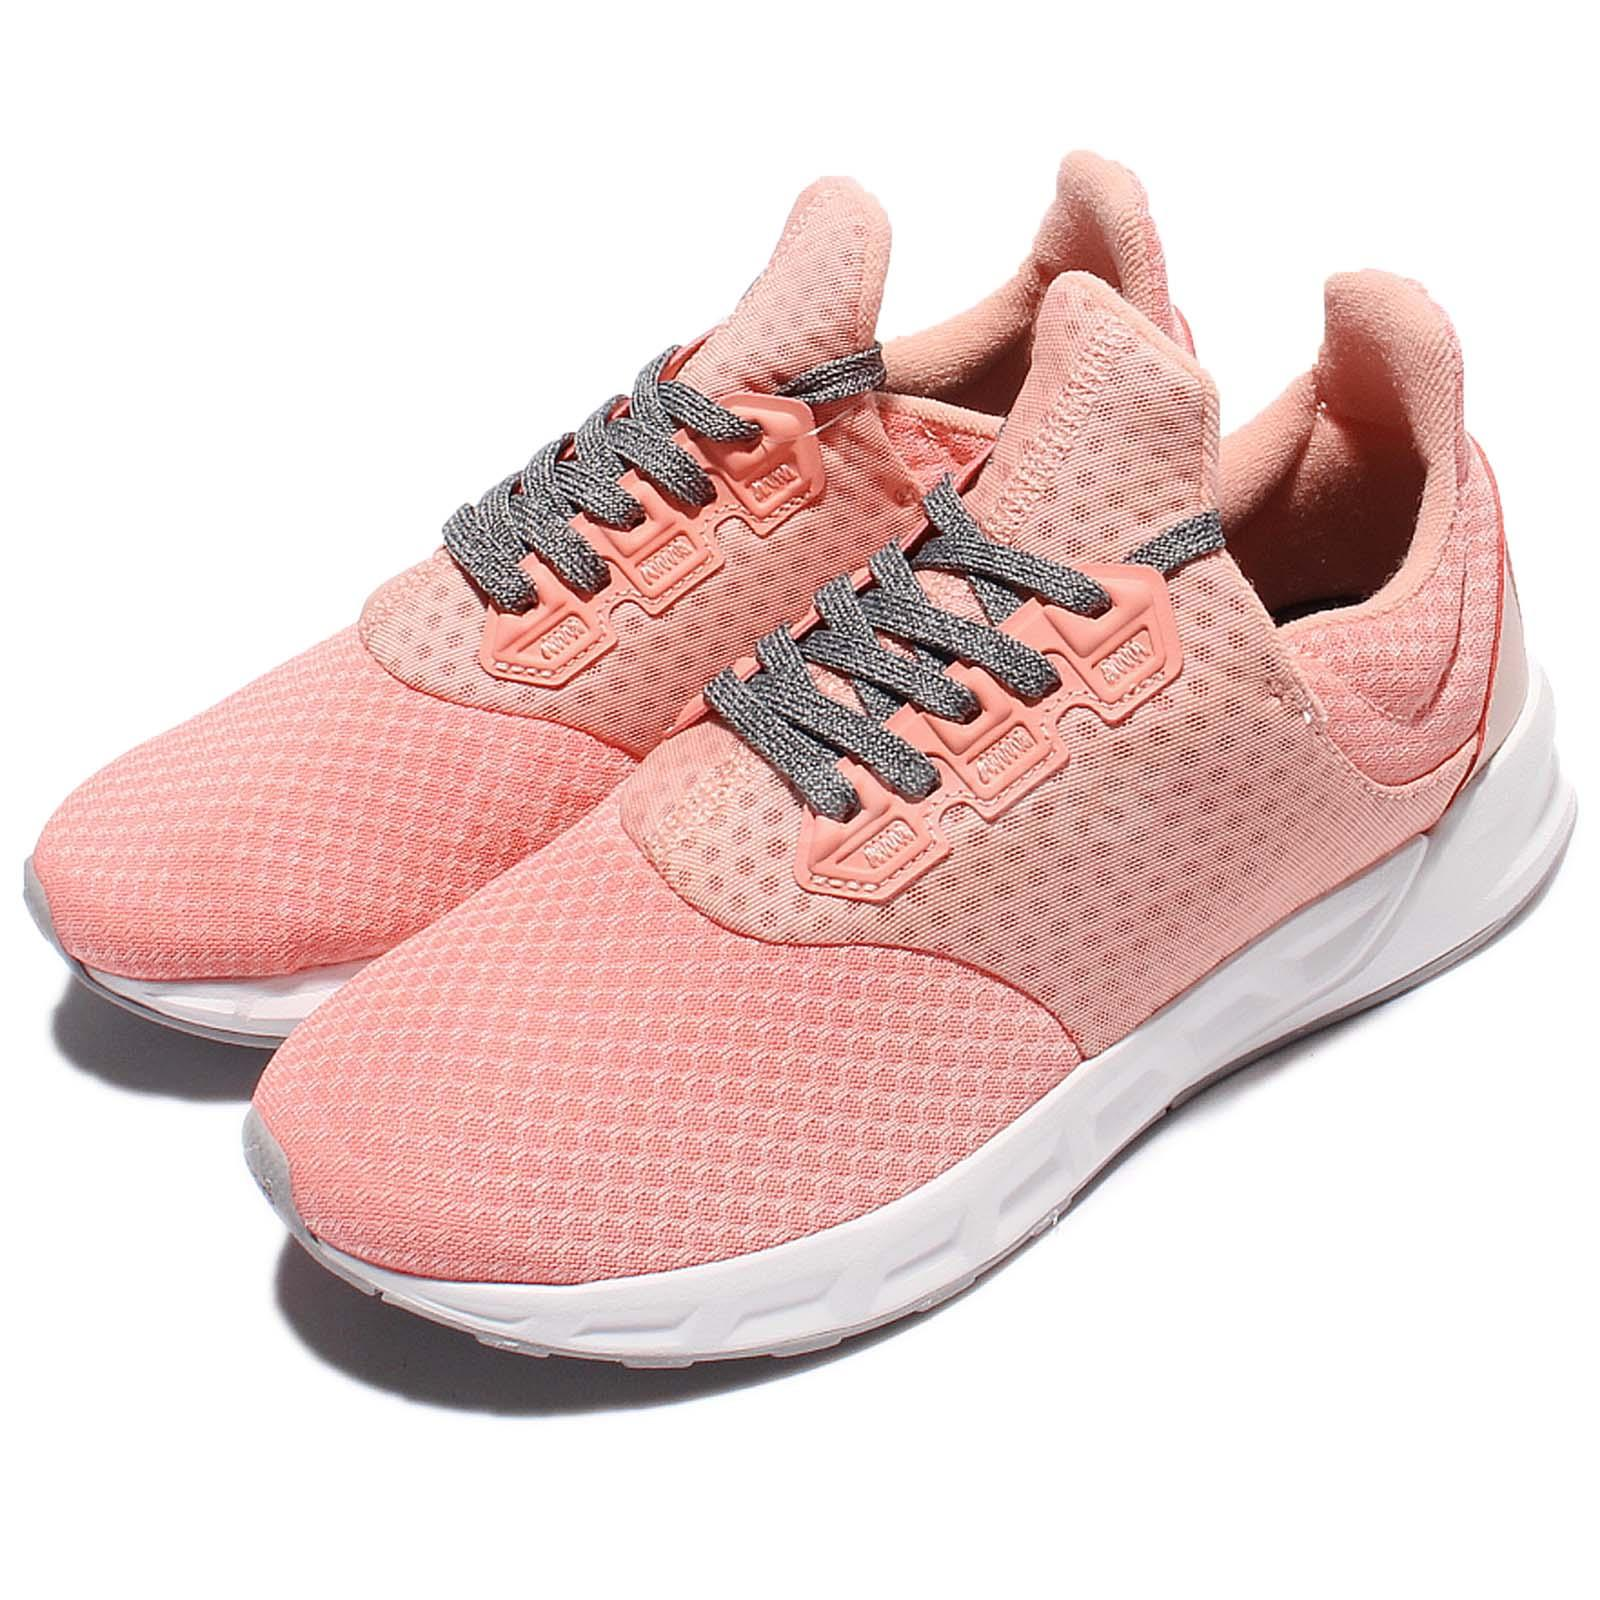 adidas Falcon Elite 5 W Pink Grey Women Running Shoes